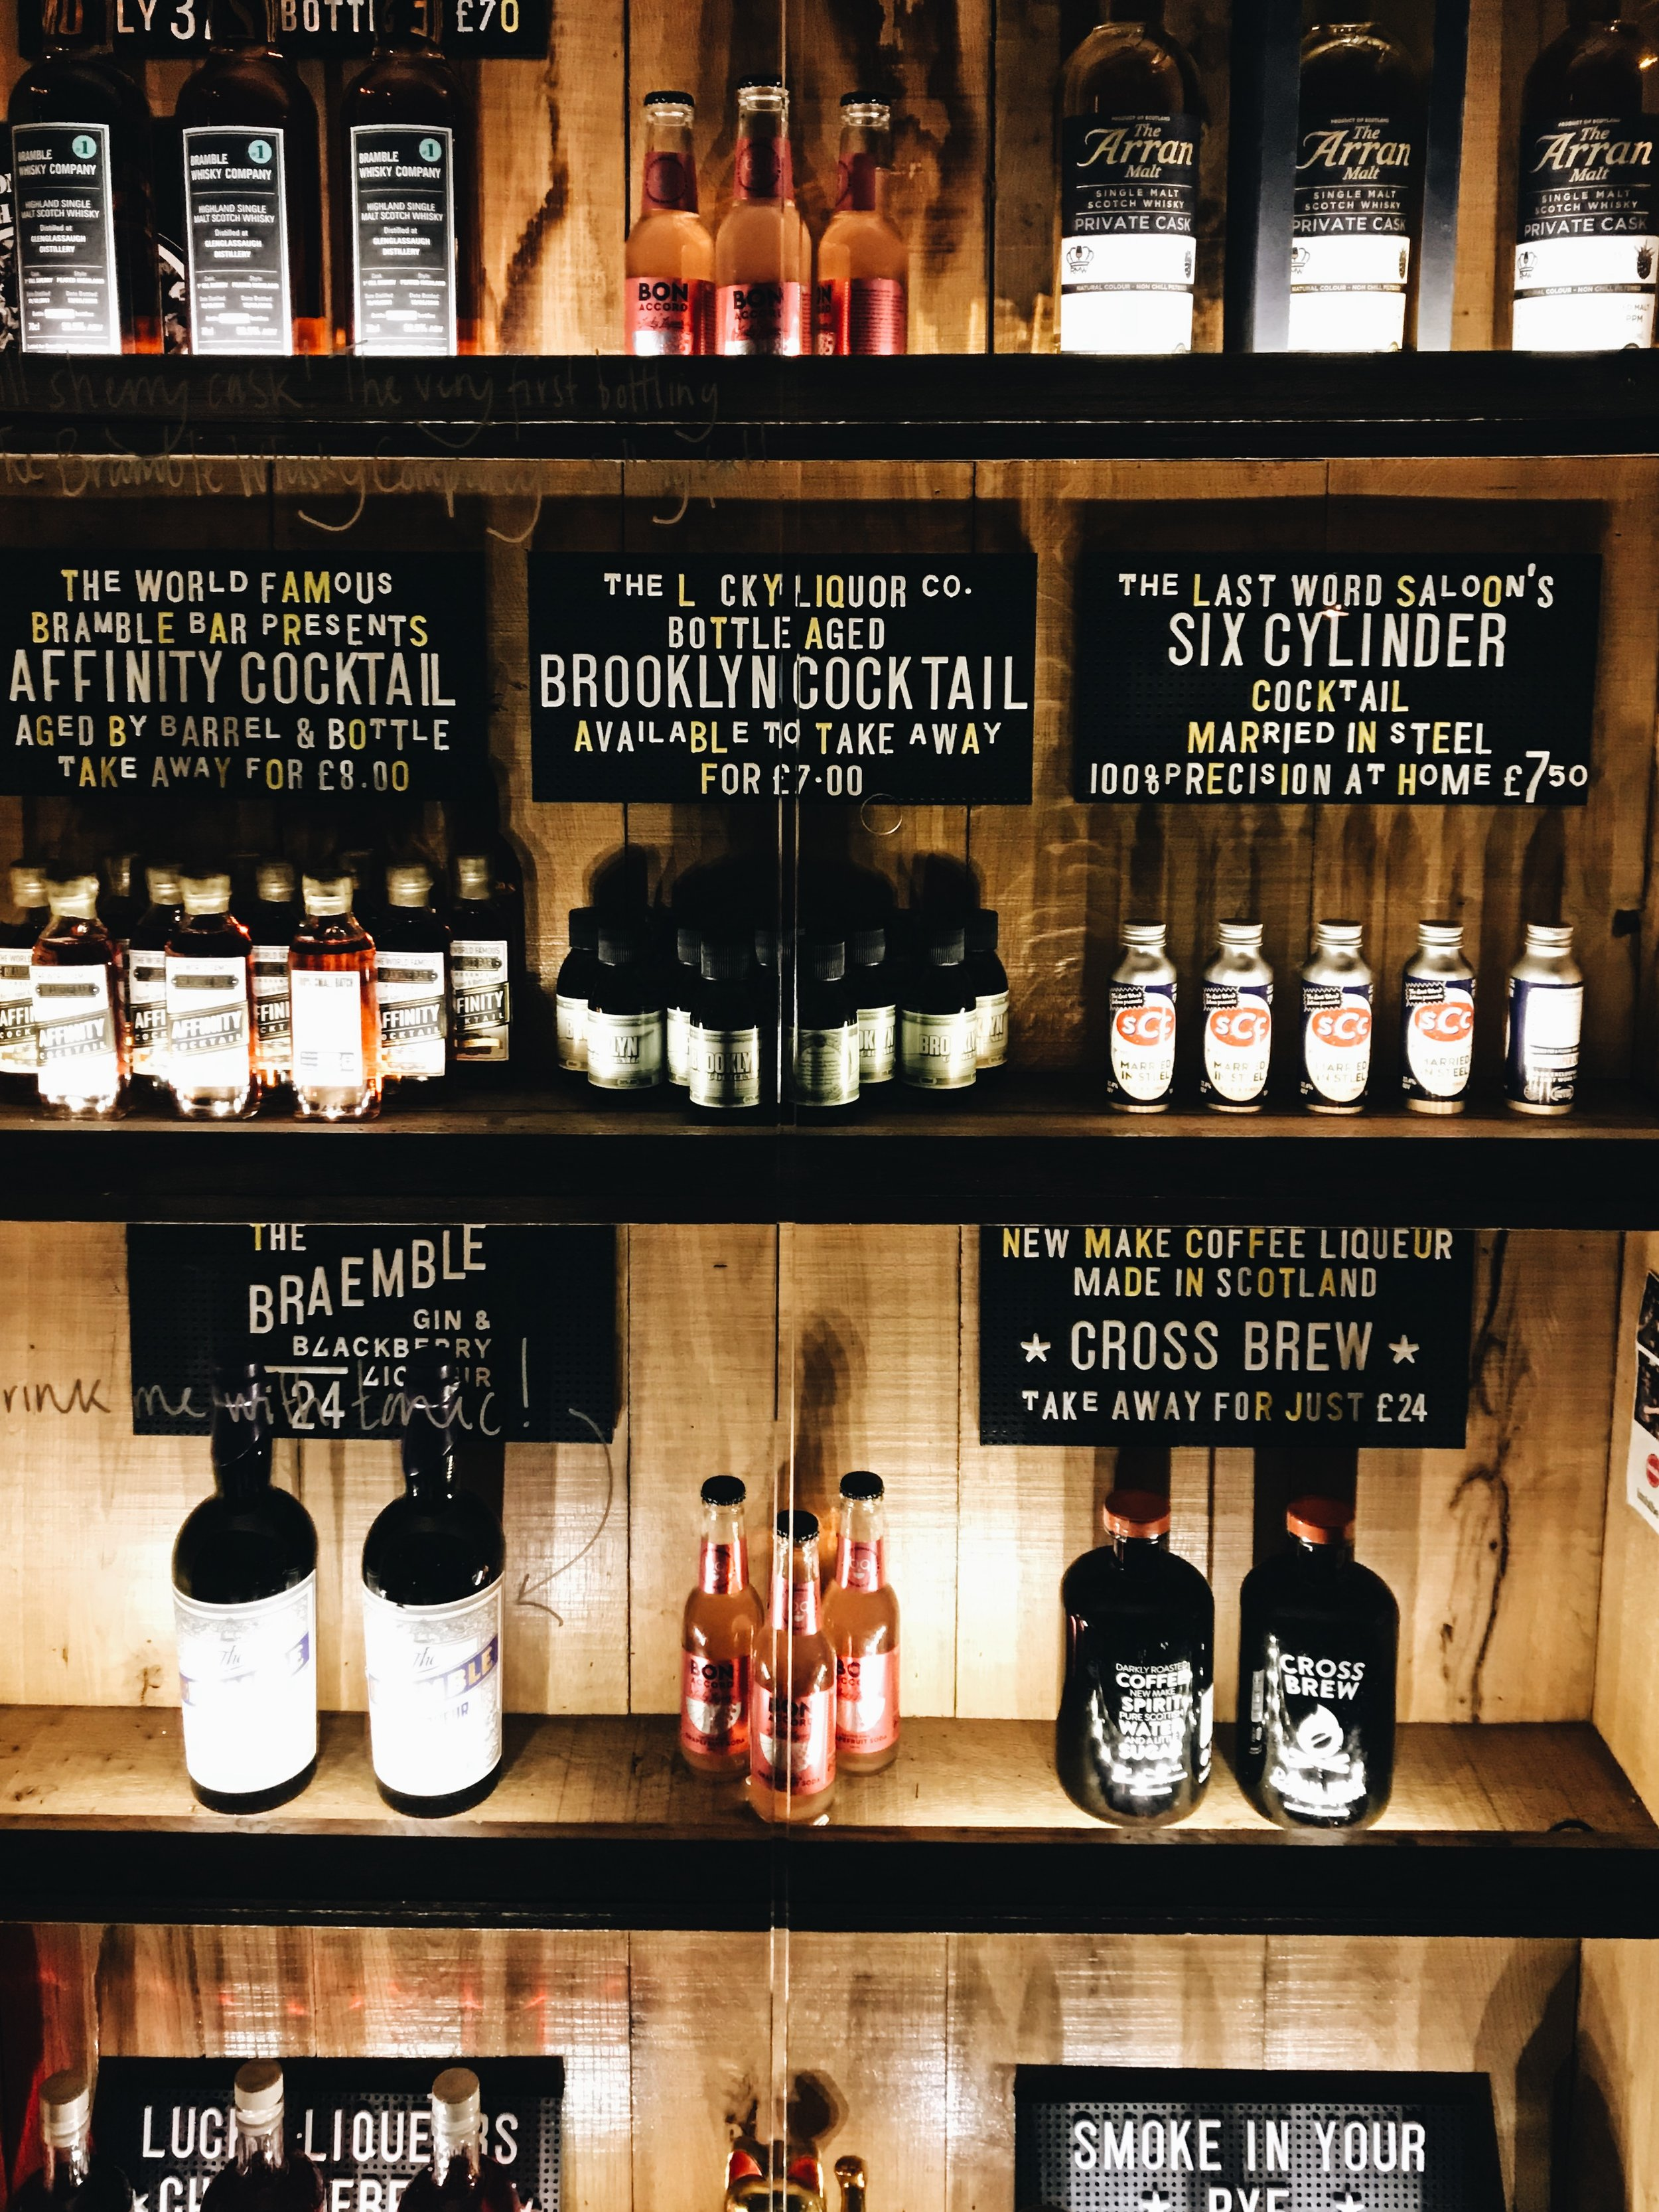 Lucky Liquor Co in Edinburgh